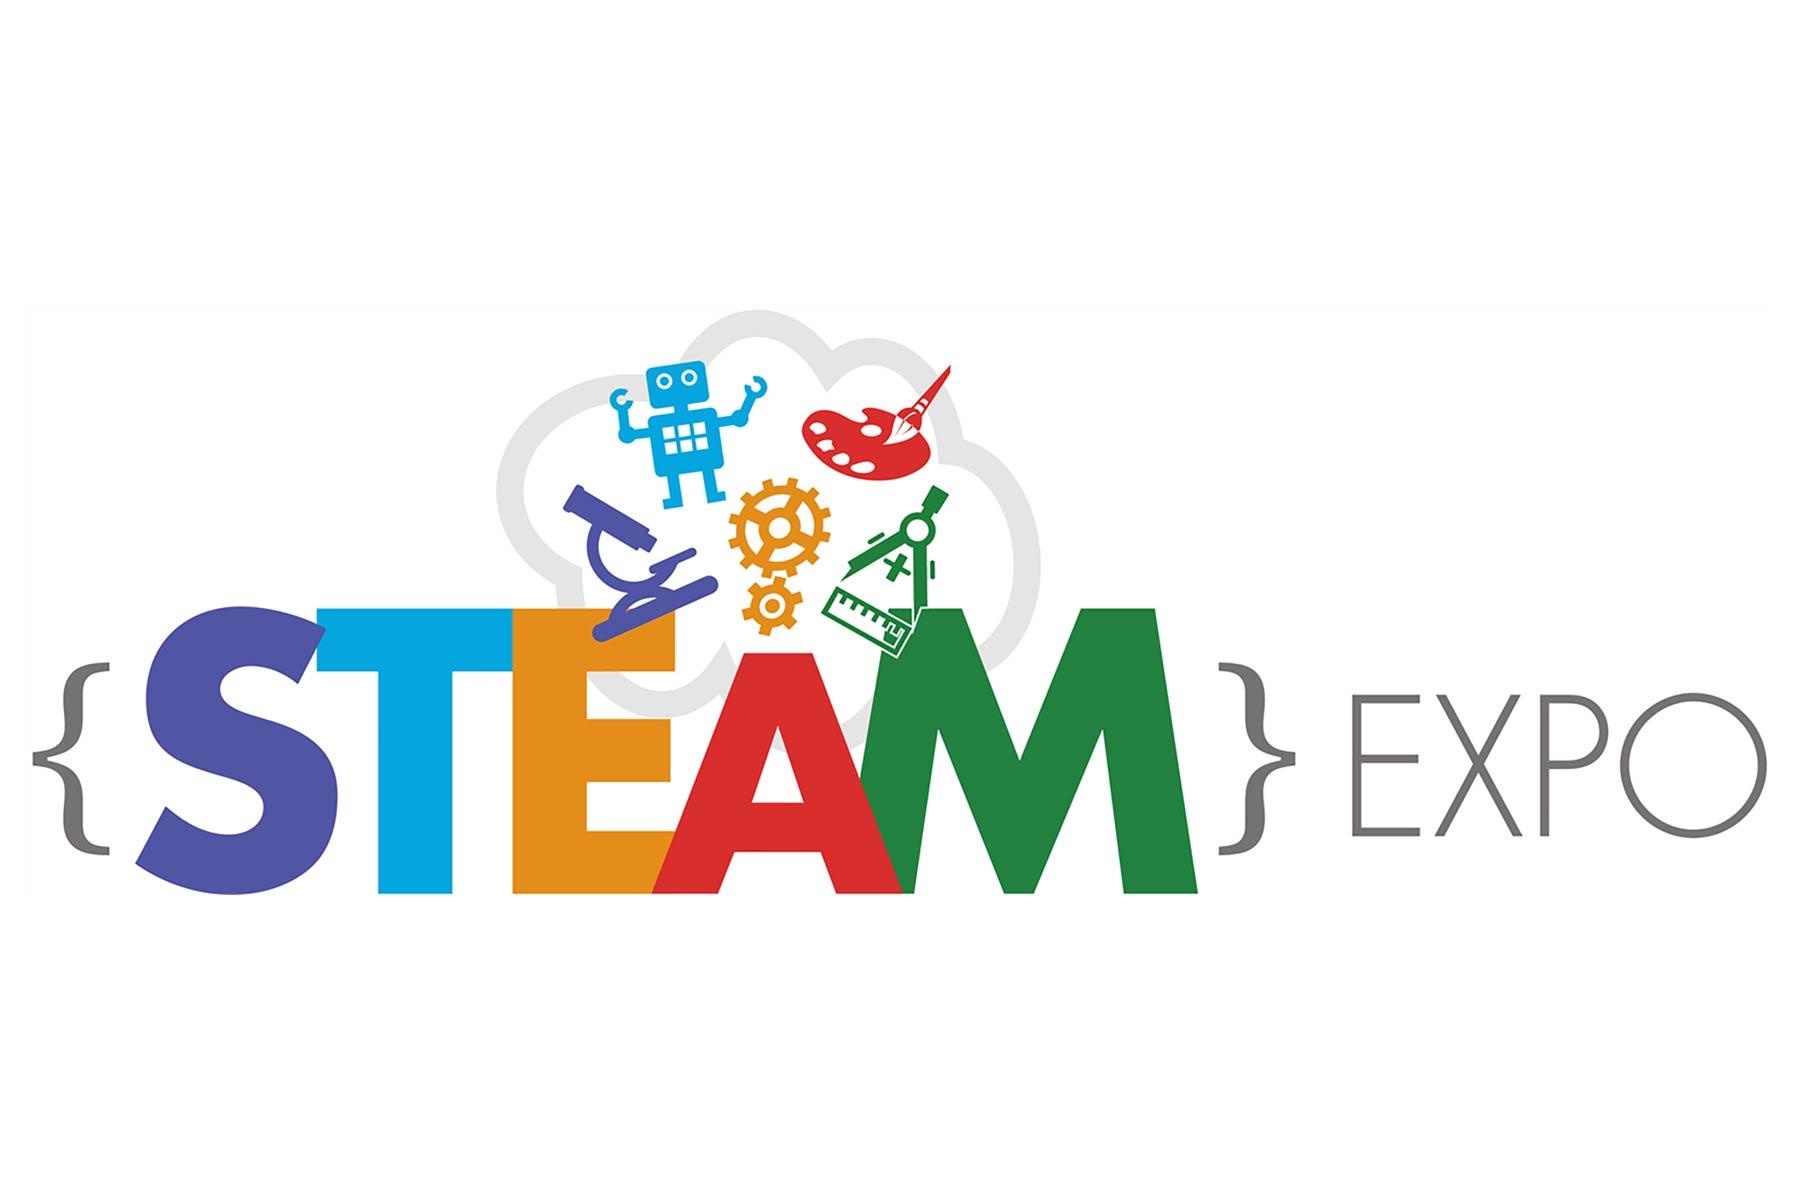 STEAM Expo of Santa Clara Unified School District